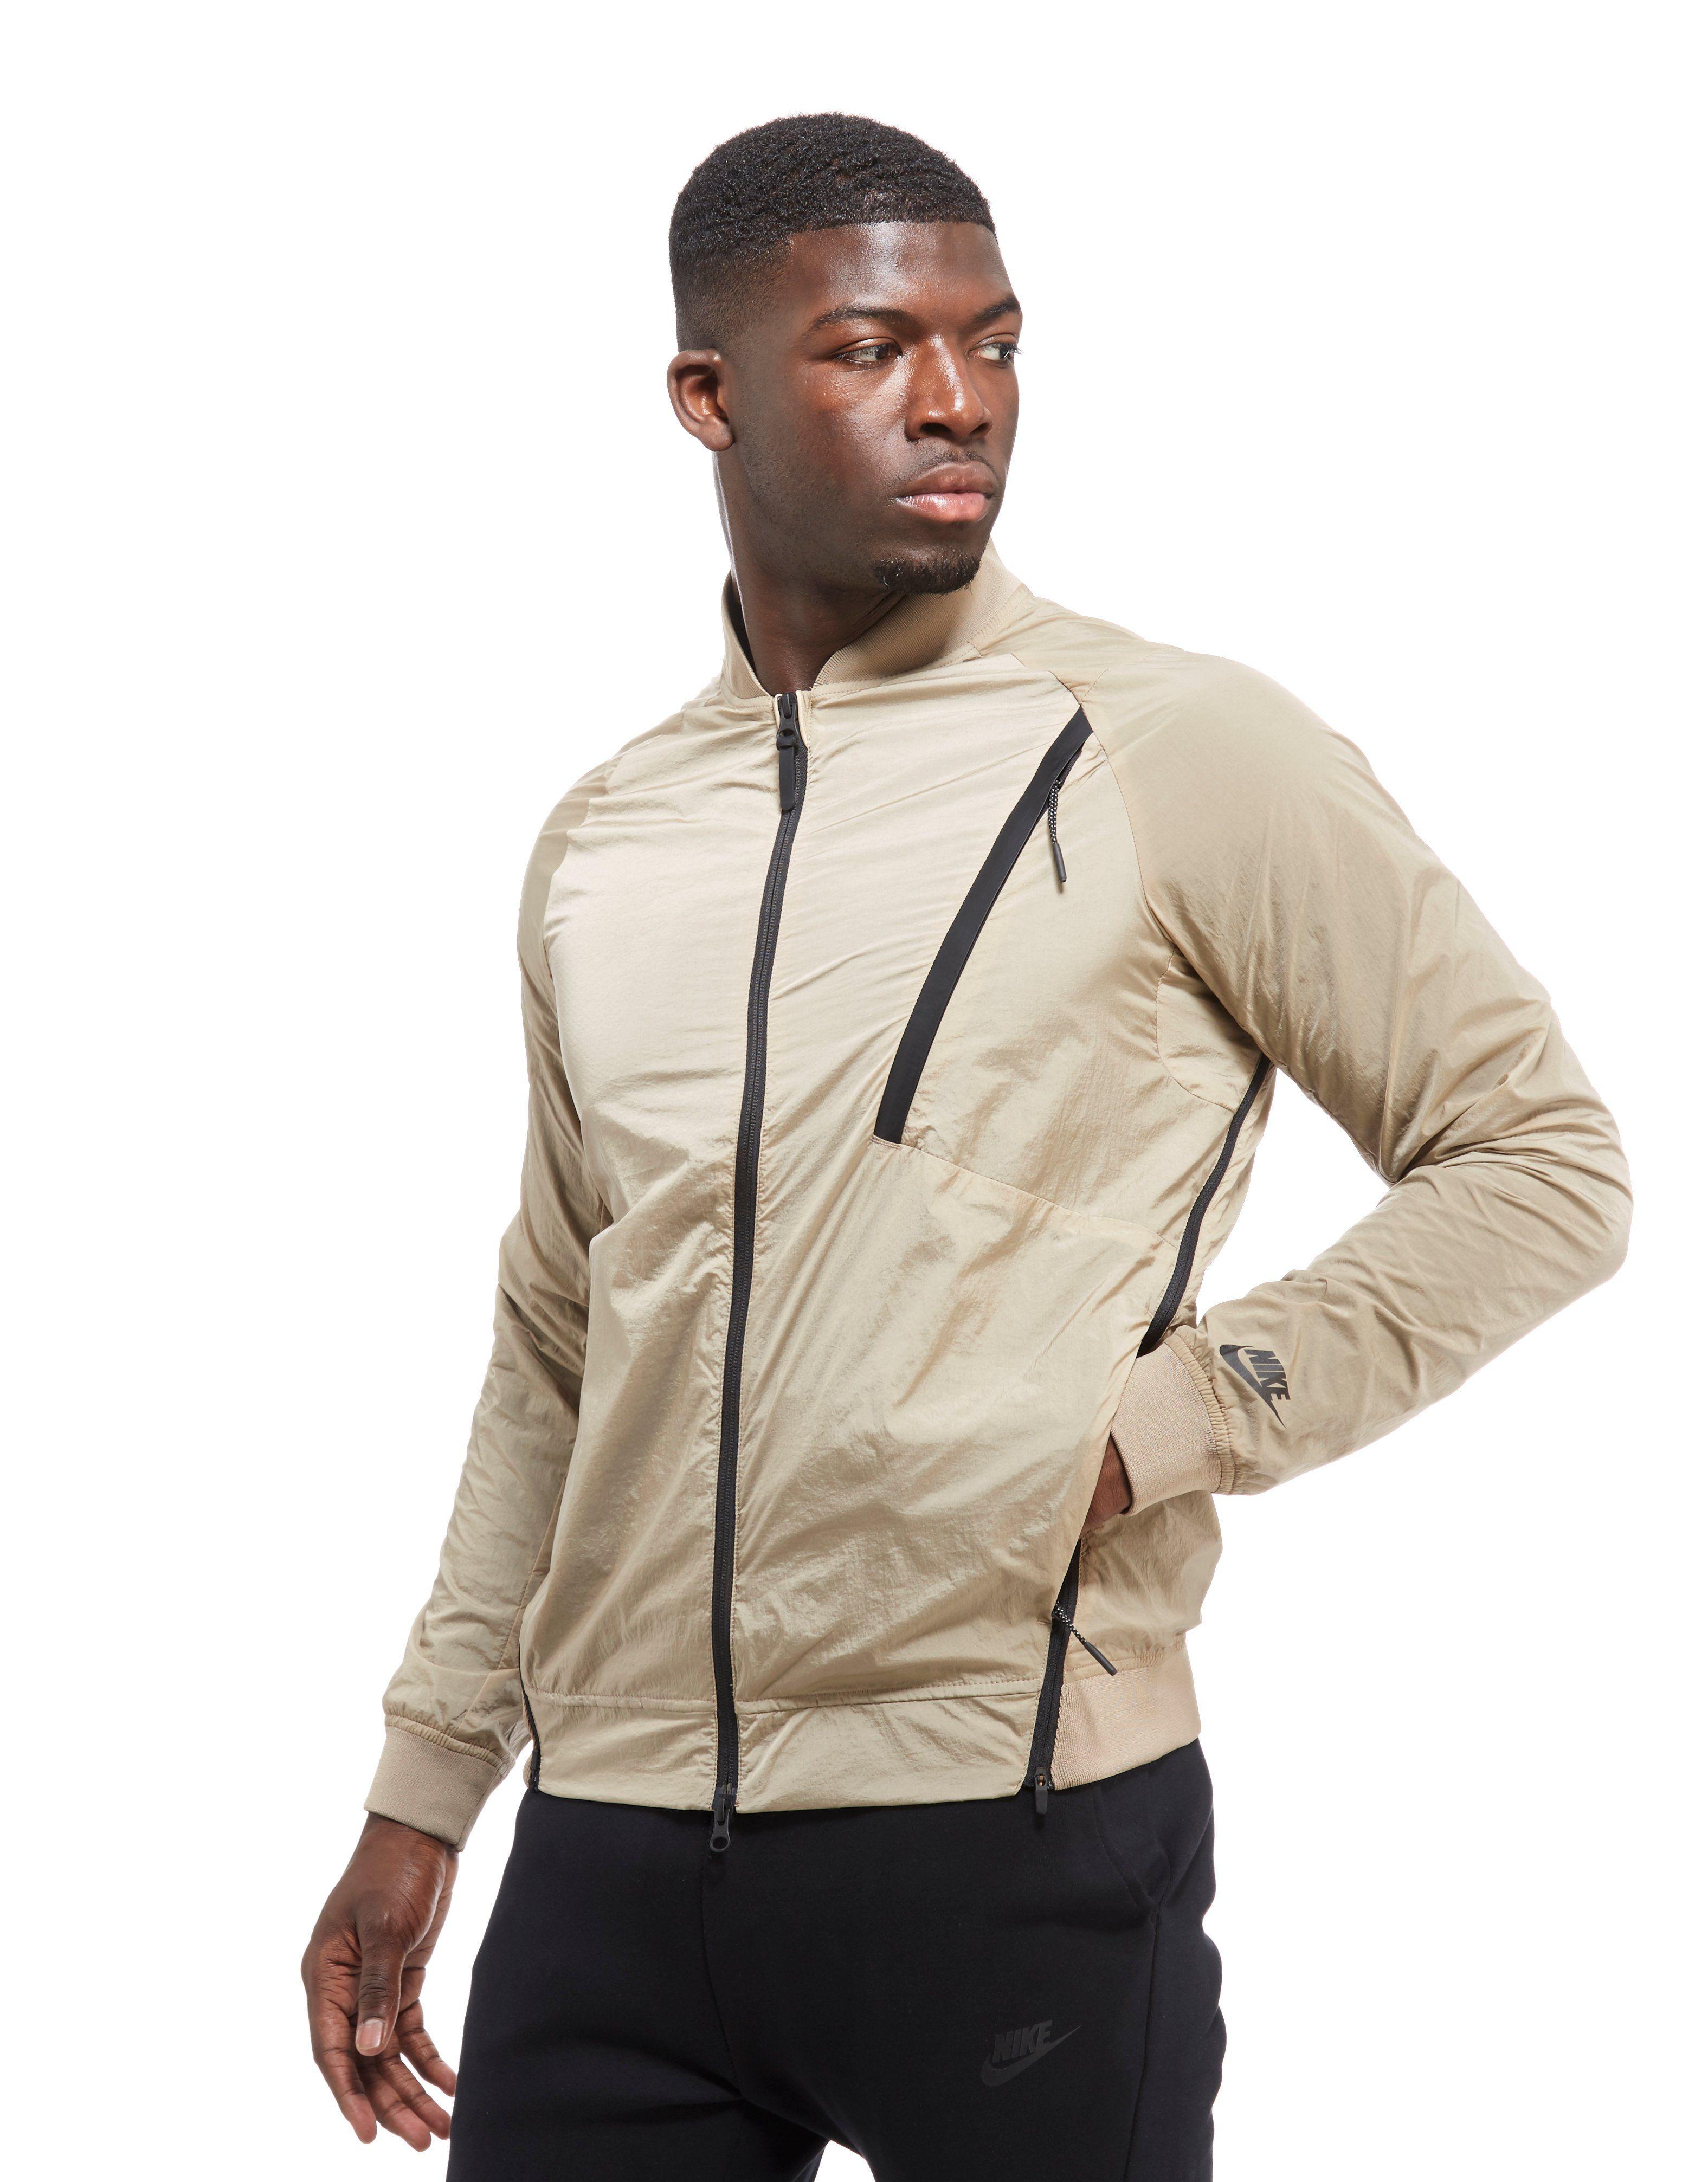 Nike jackets cheap - Nike Tech Hypermesh Varsity Jacket